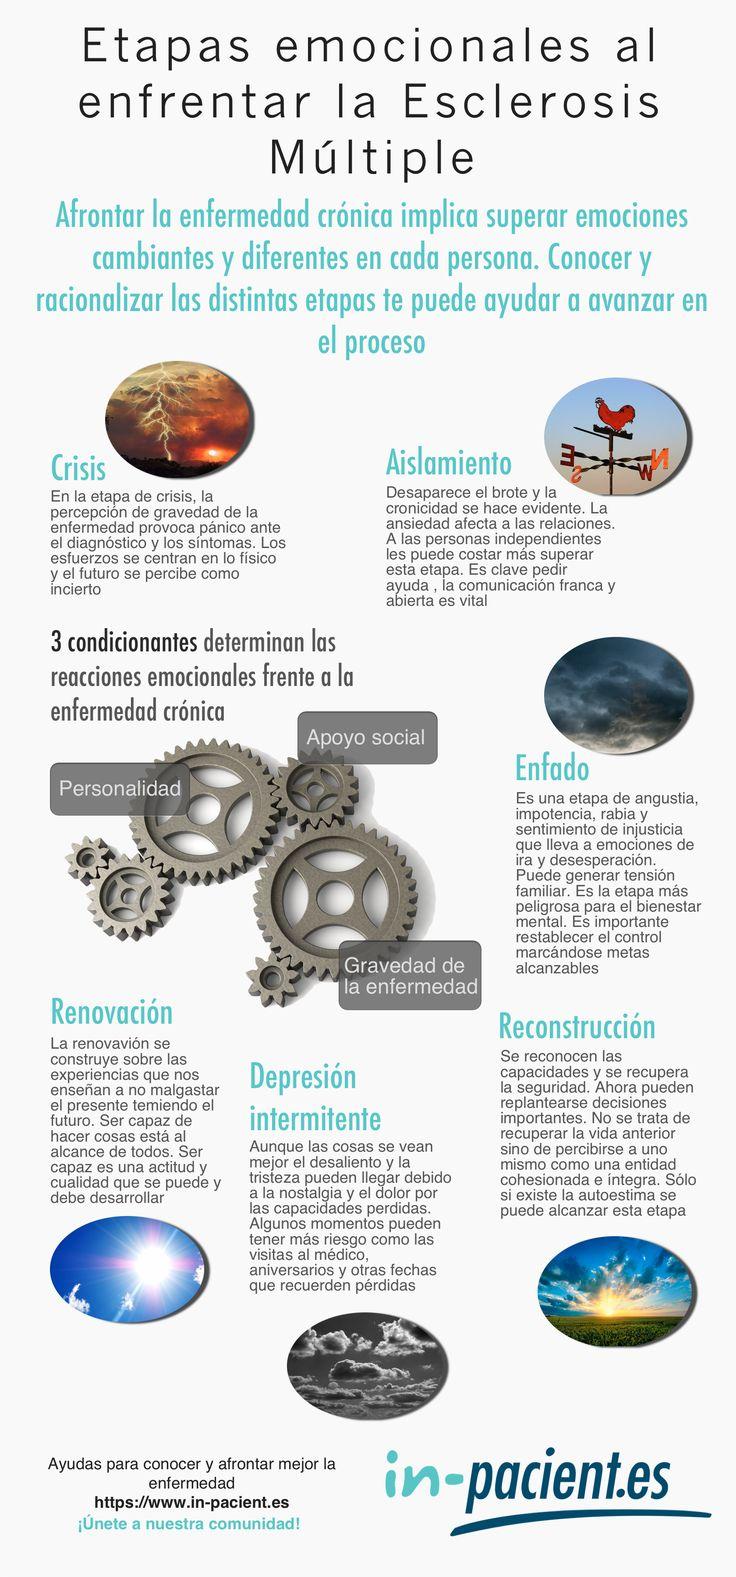 Etapas emocionales al enfrentar la Esclerosis Múltiple